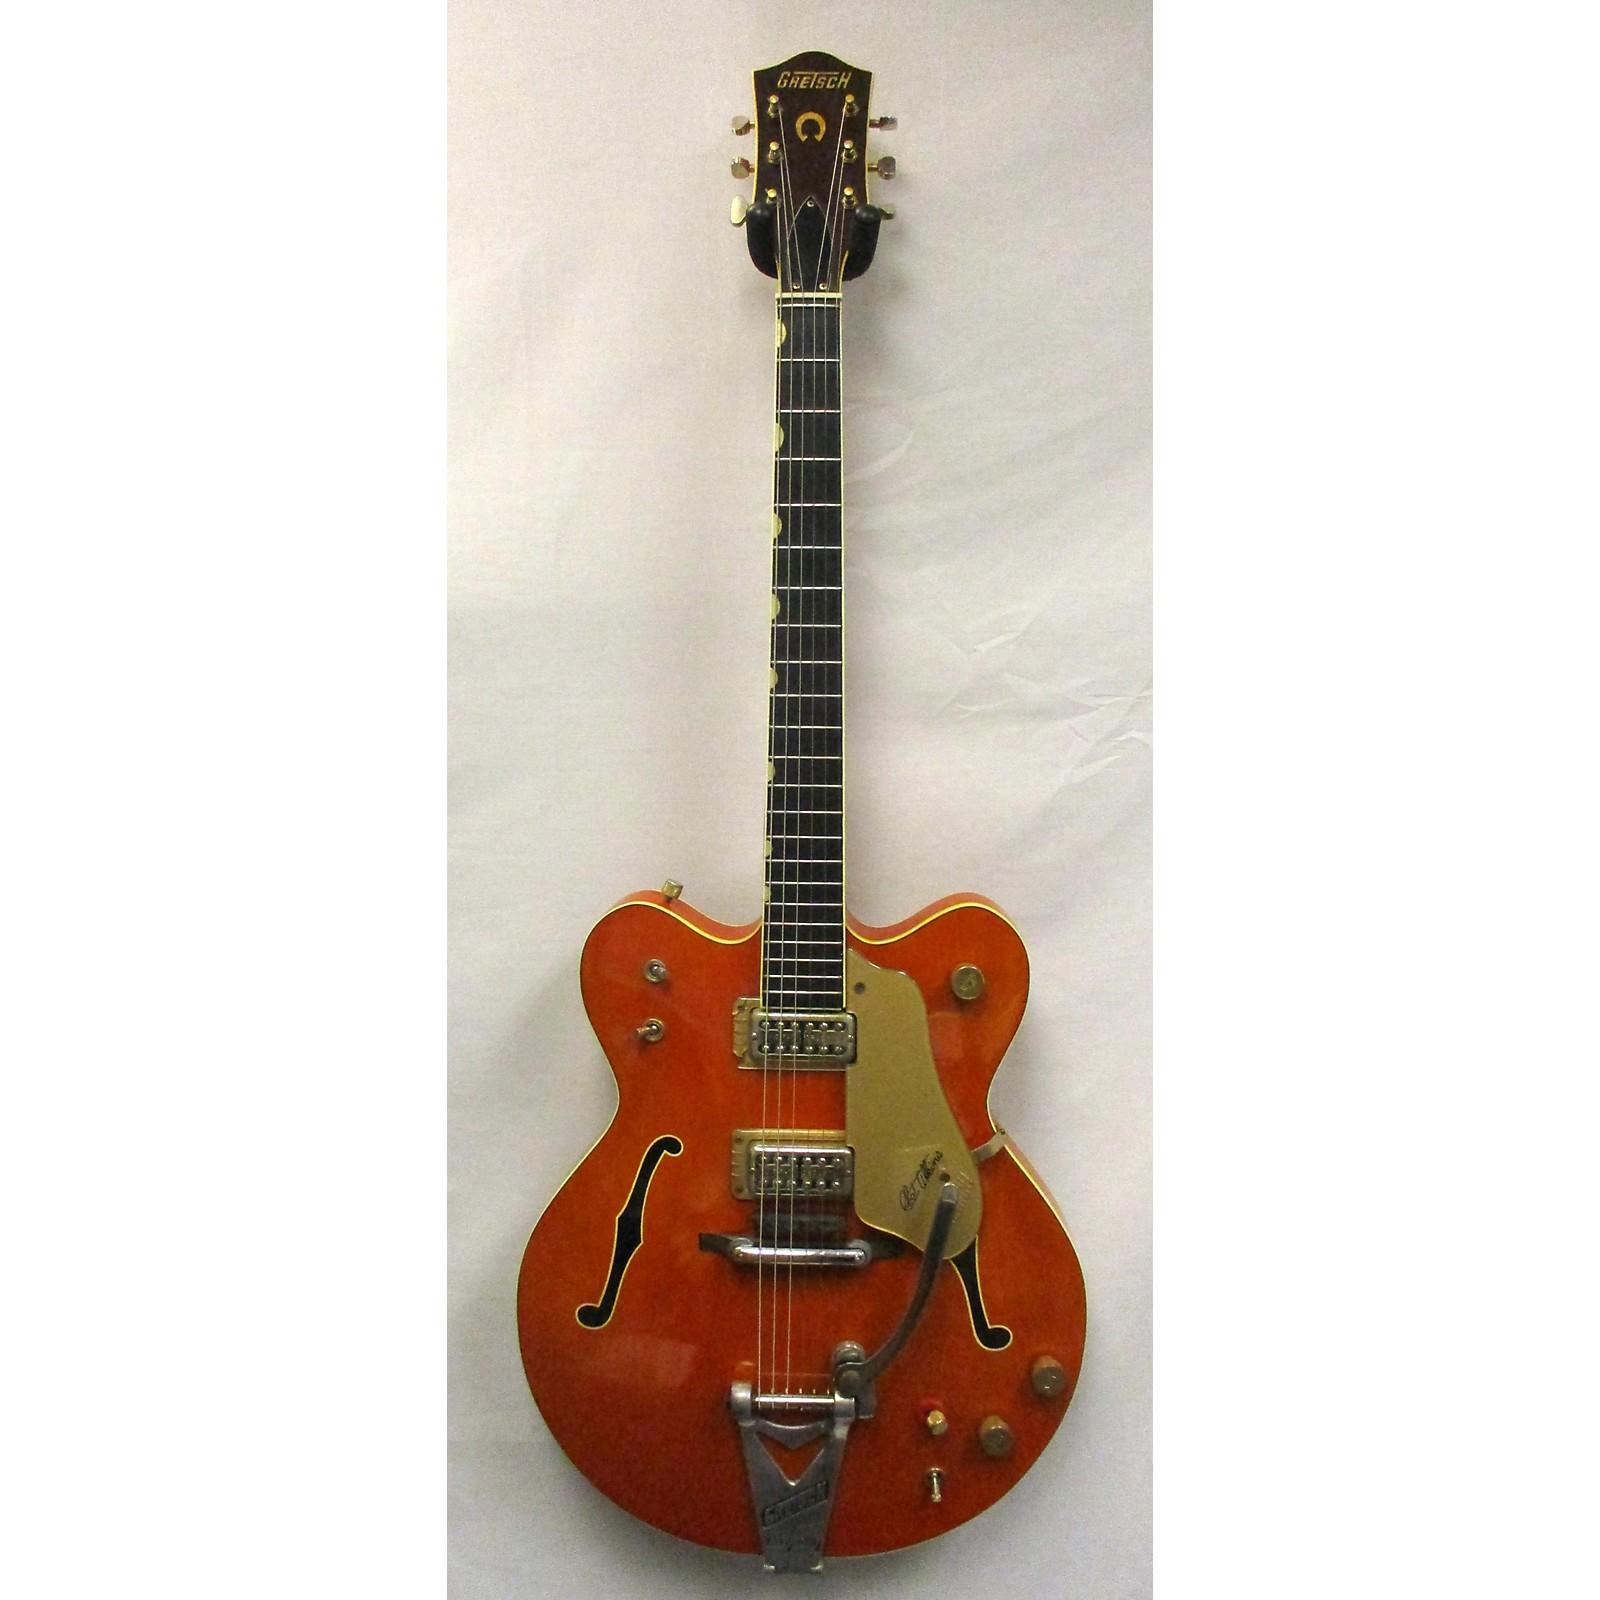 Gretsch Guitars Chet Atkins Nashville 6120 Hollow Body Electric Guitar